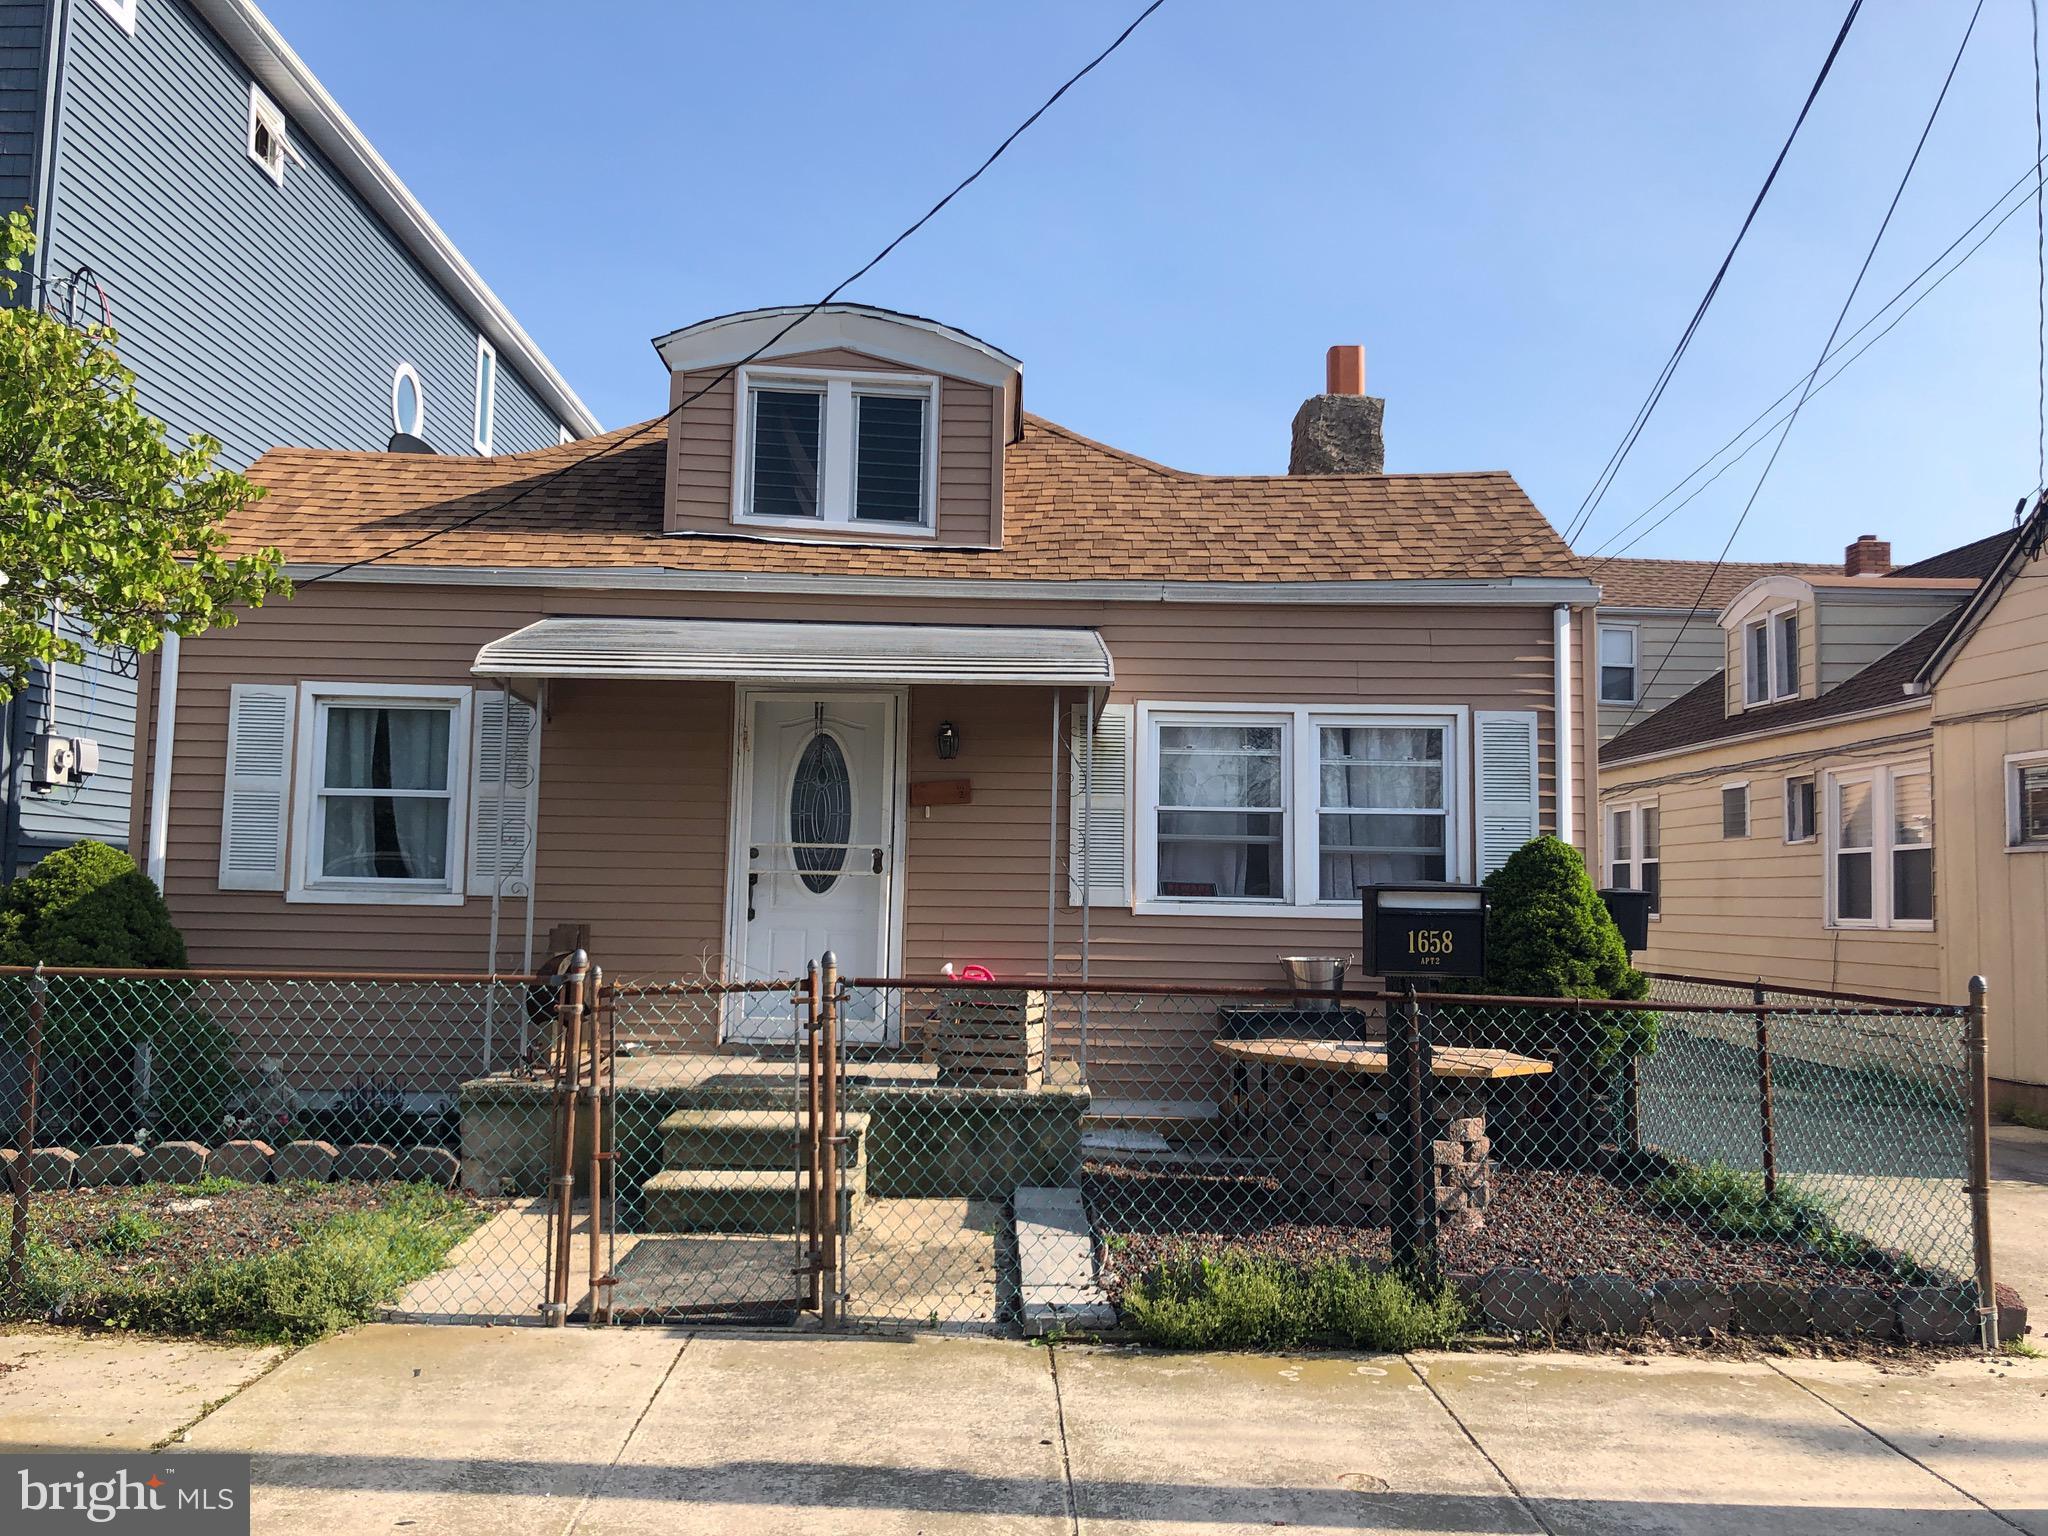 1658 W RIVERSIDE DRIVE W, ATLANTIC CITY, NJ 08401